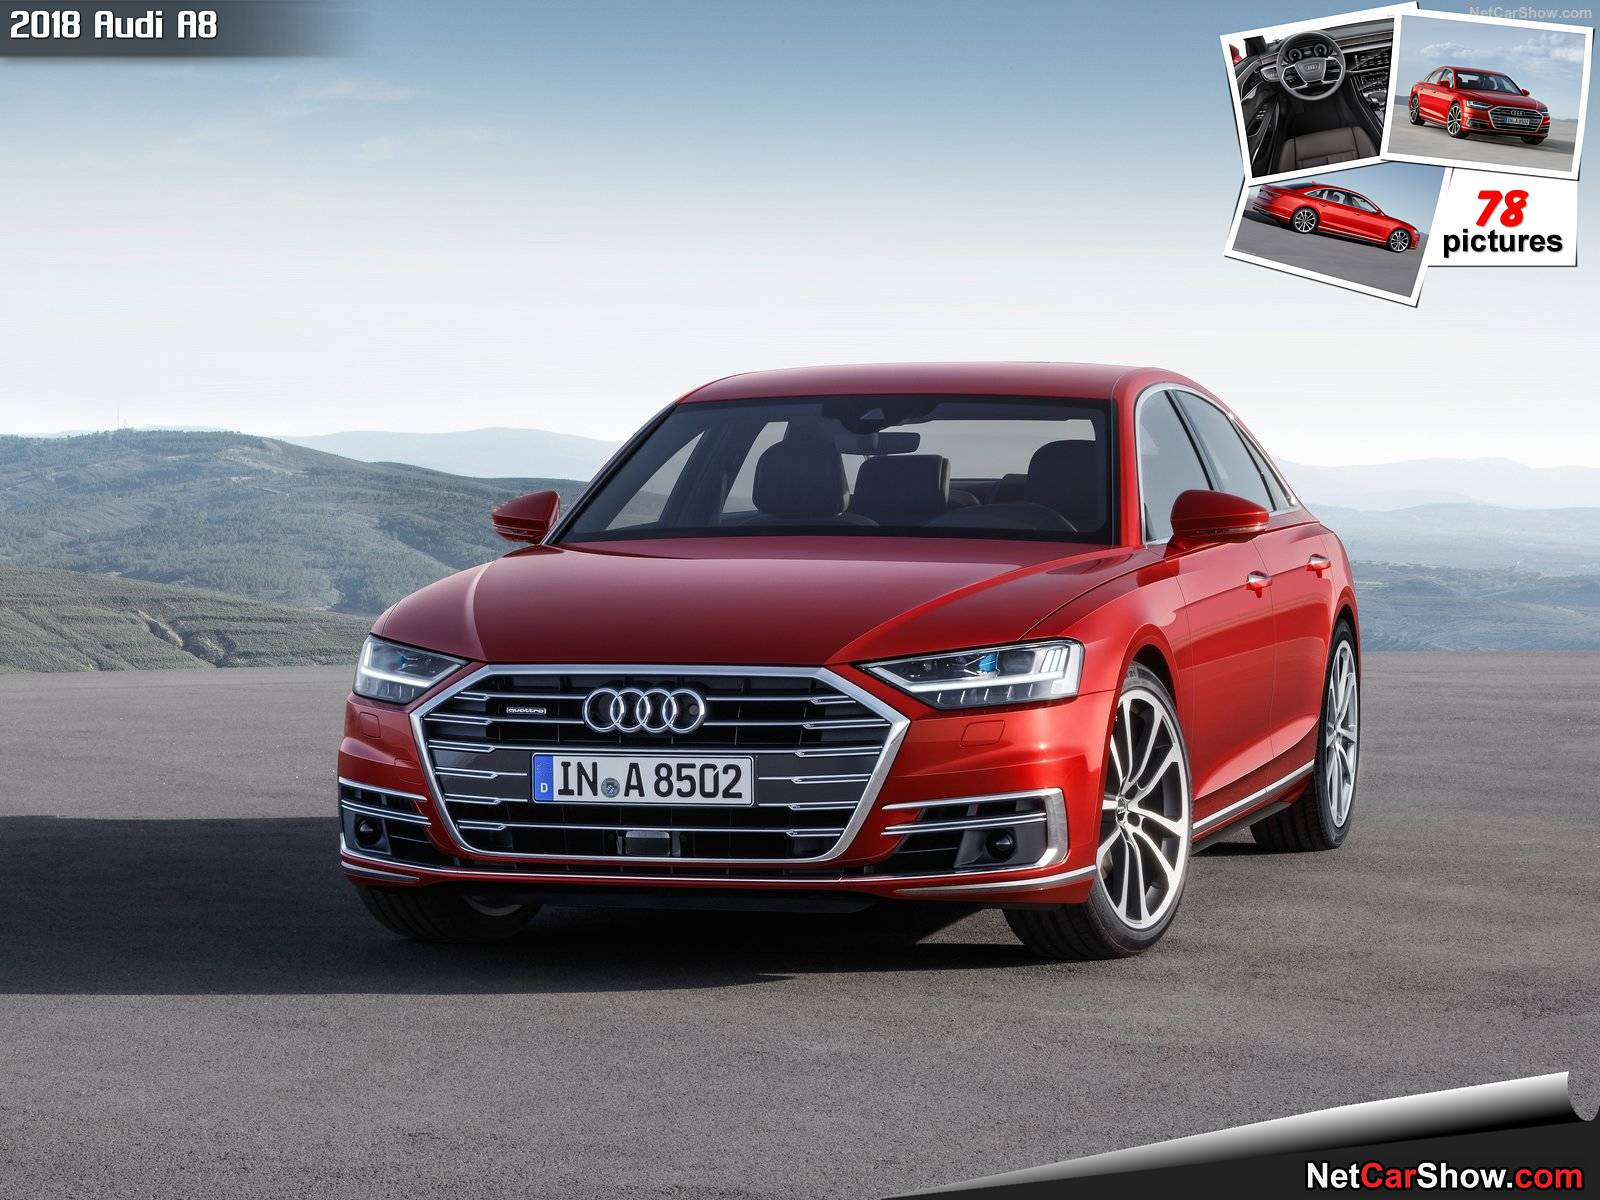 2_1499874687808_Audi-A8-2018-1600-02.jpg